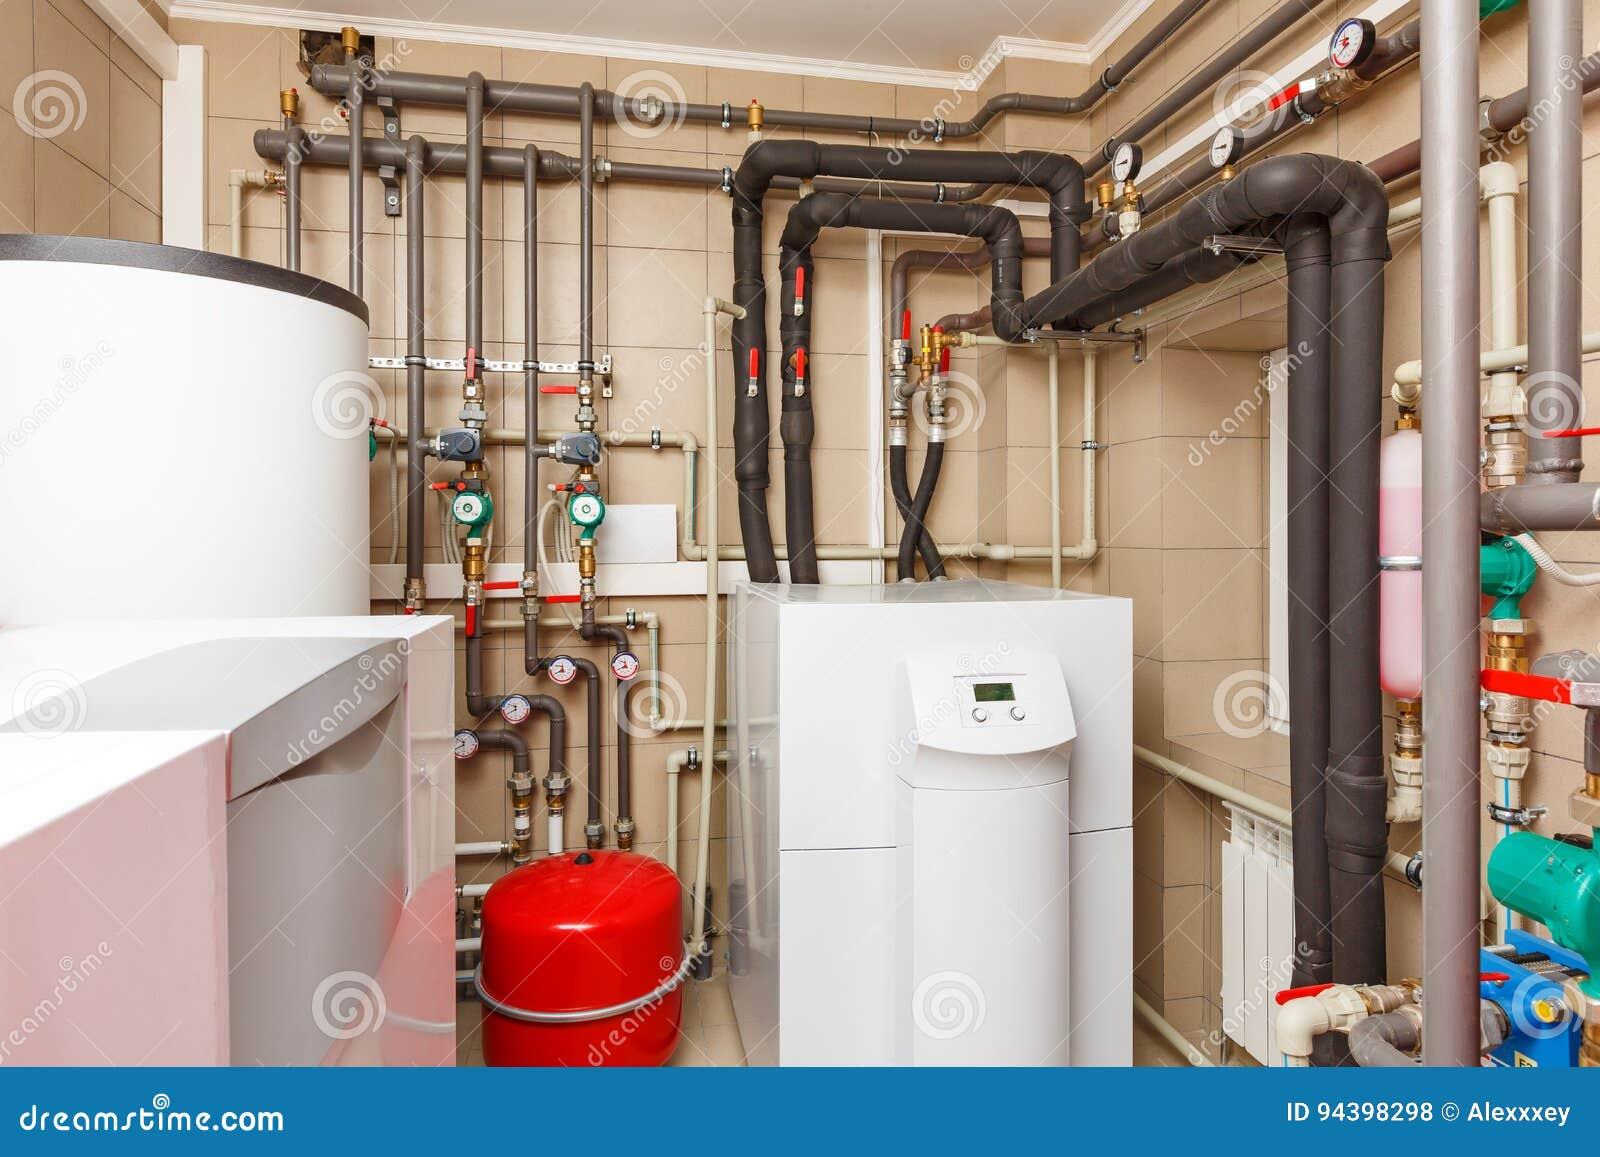 Household Boiler House With Heat Pump, Barrel; Valves; Sensors A ...